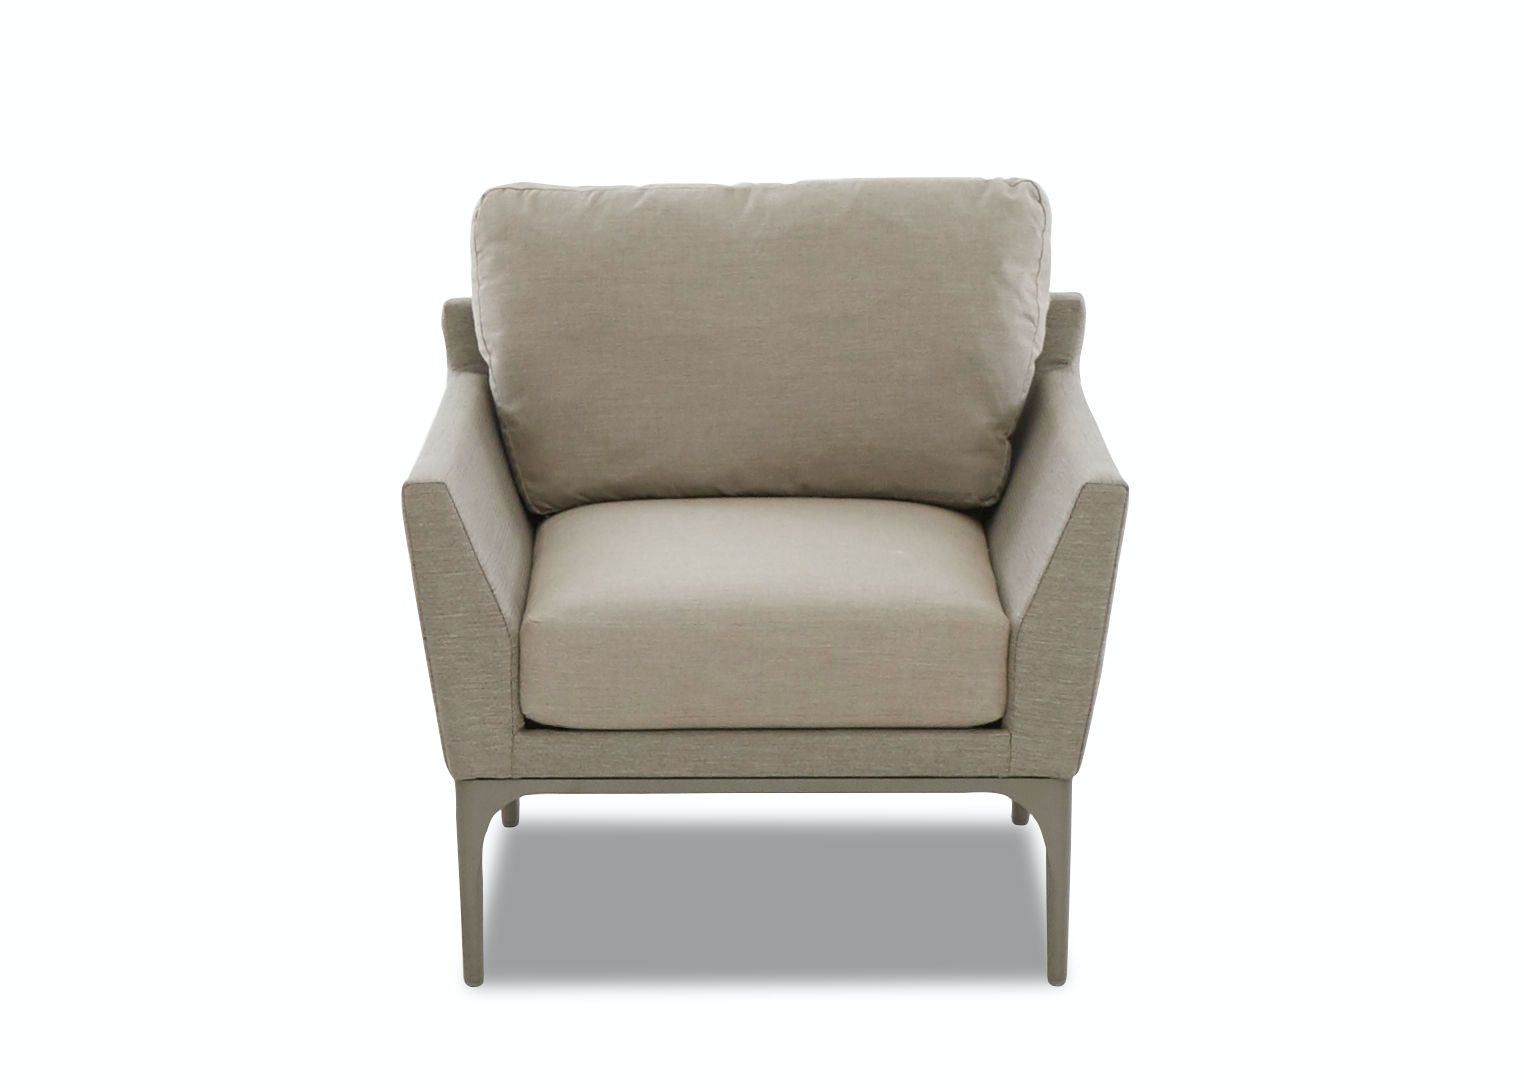 Merveilleux Klaussner Outdoor Urban Retreat Chair W3500 C